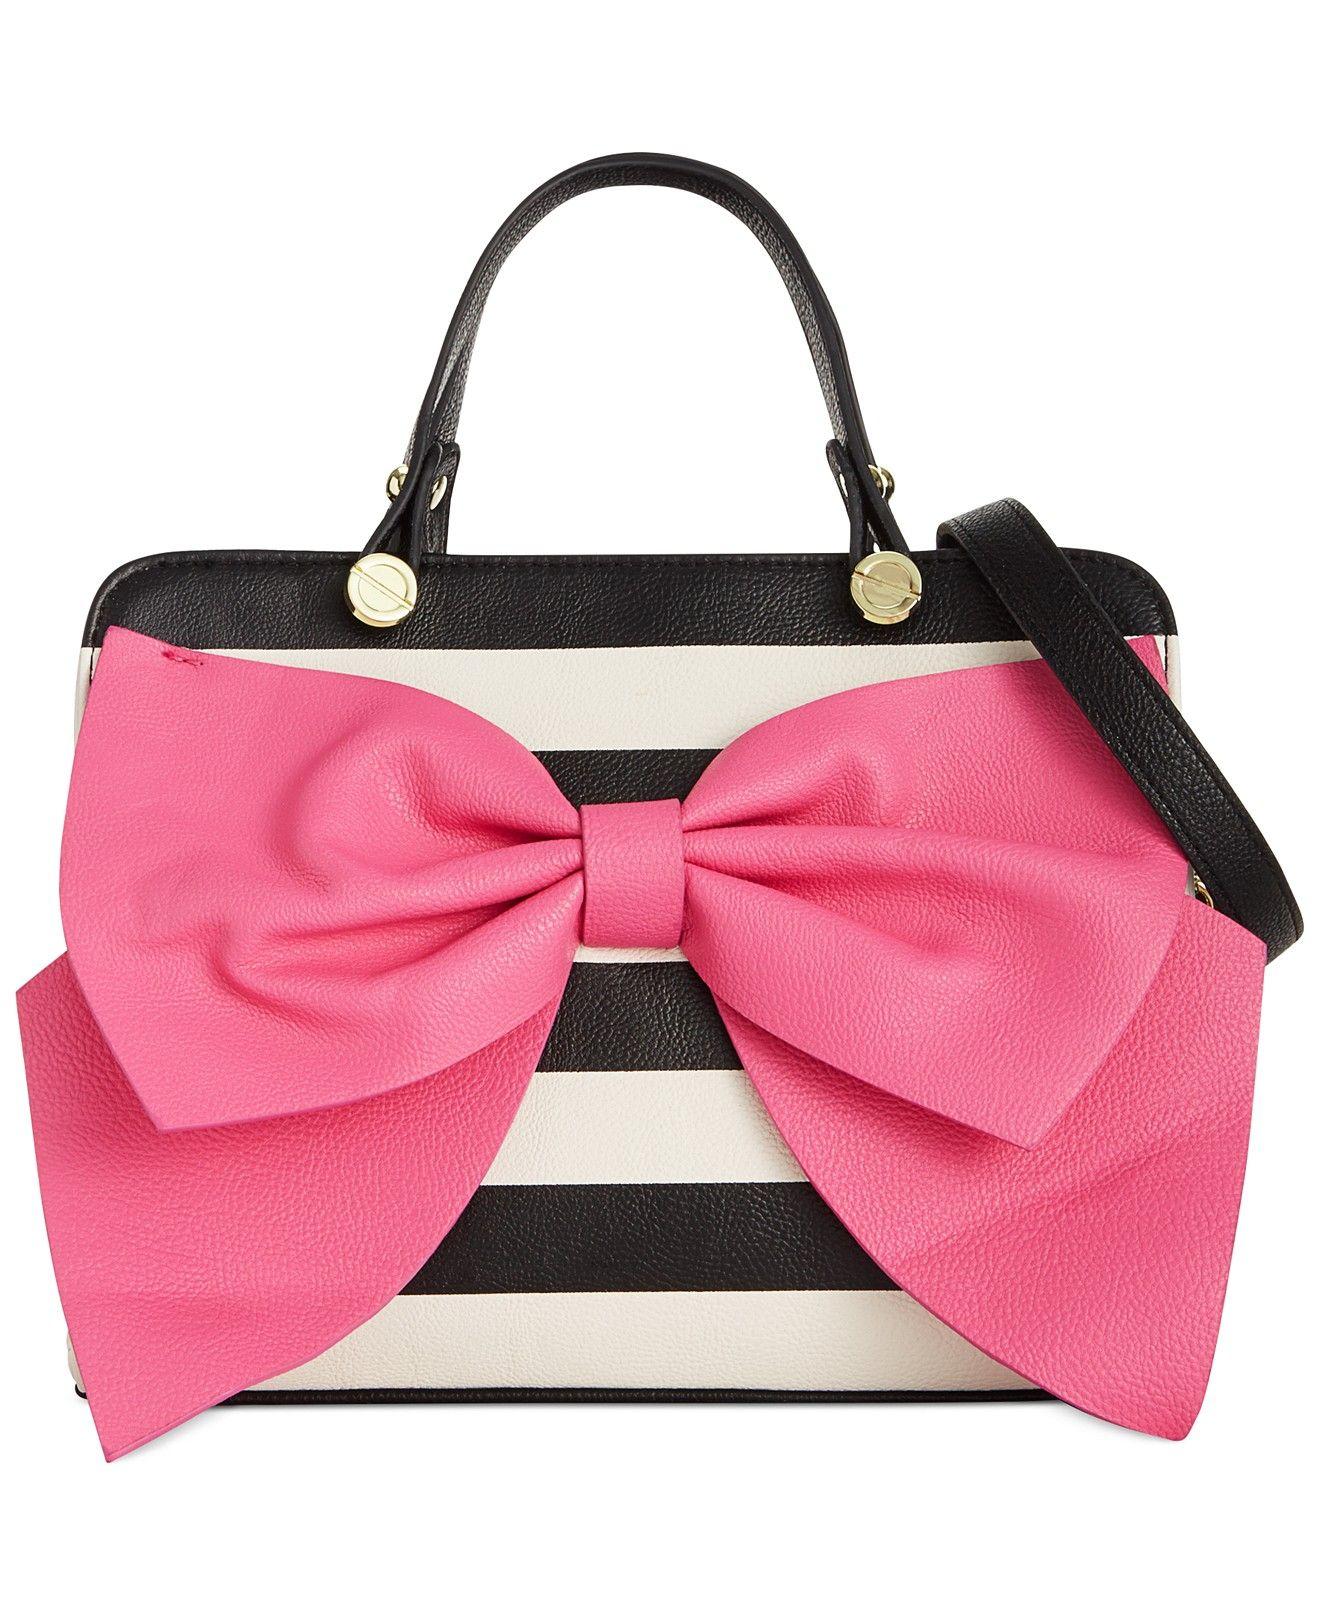 c7ceeadff Betsey Johnson Bow Regard Satchel - Handbags & Accessories - Macy's ...